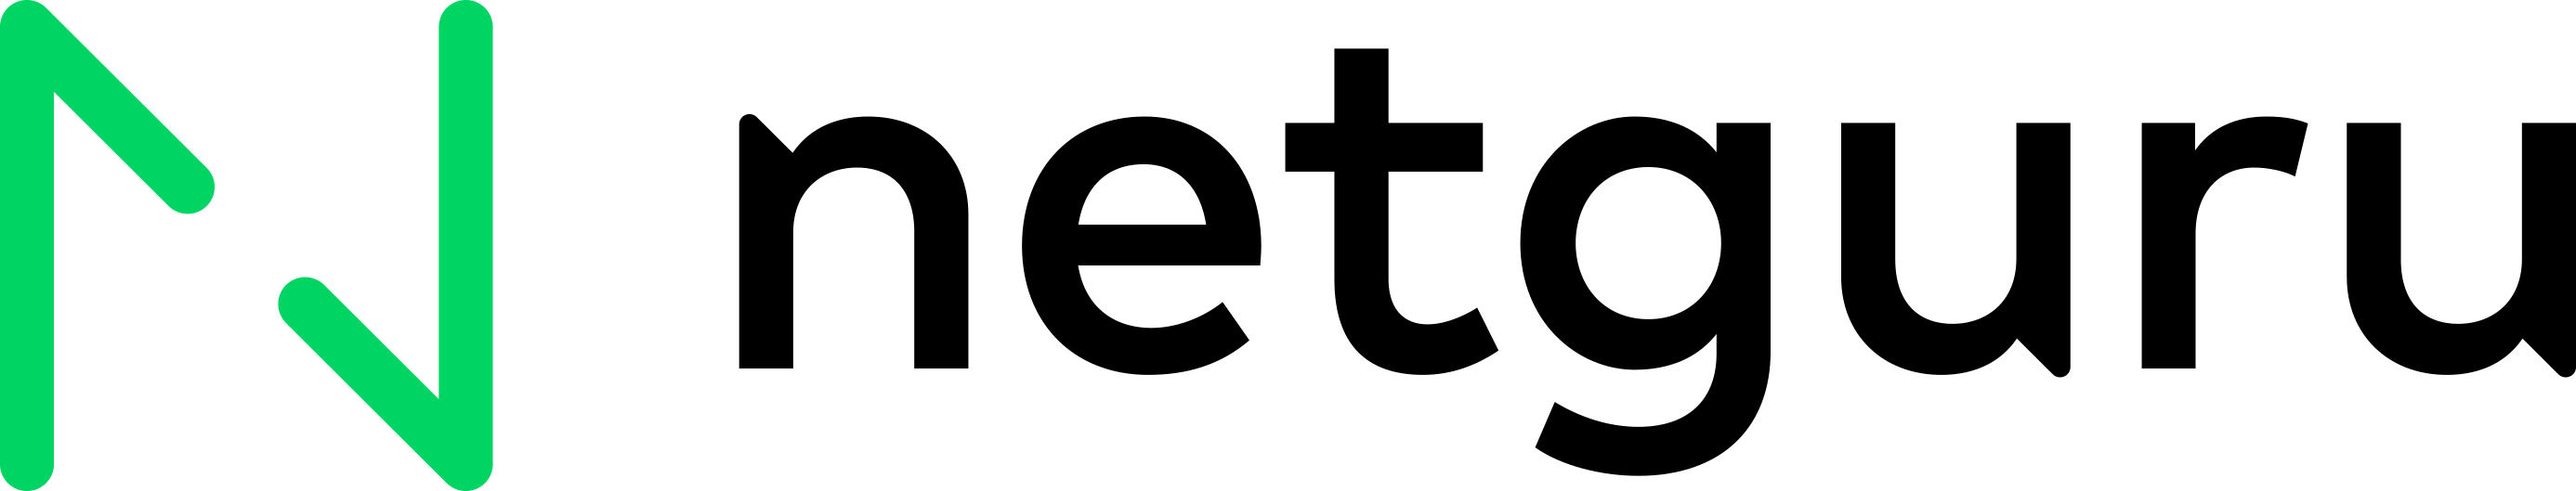 Netguru